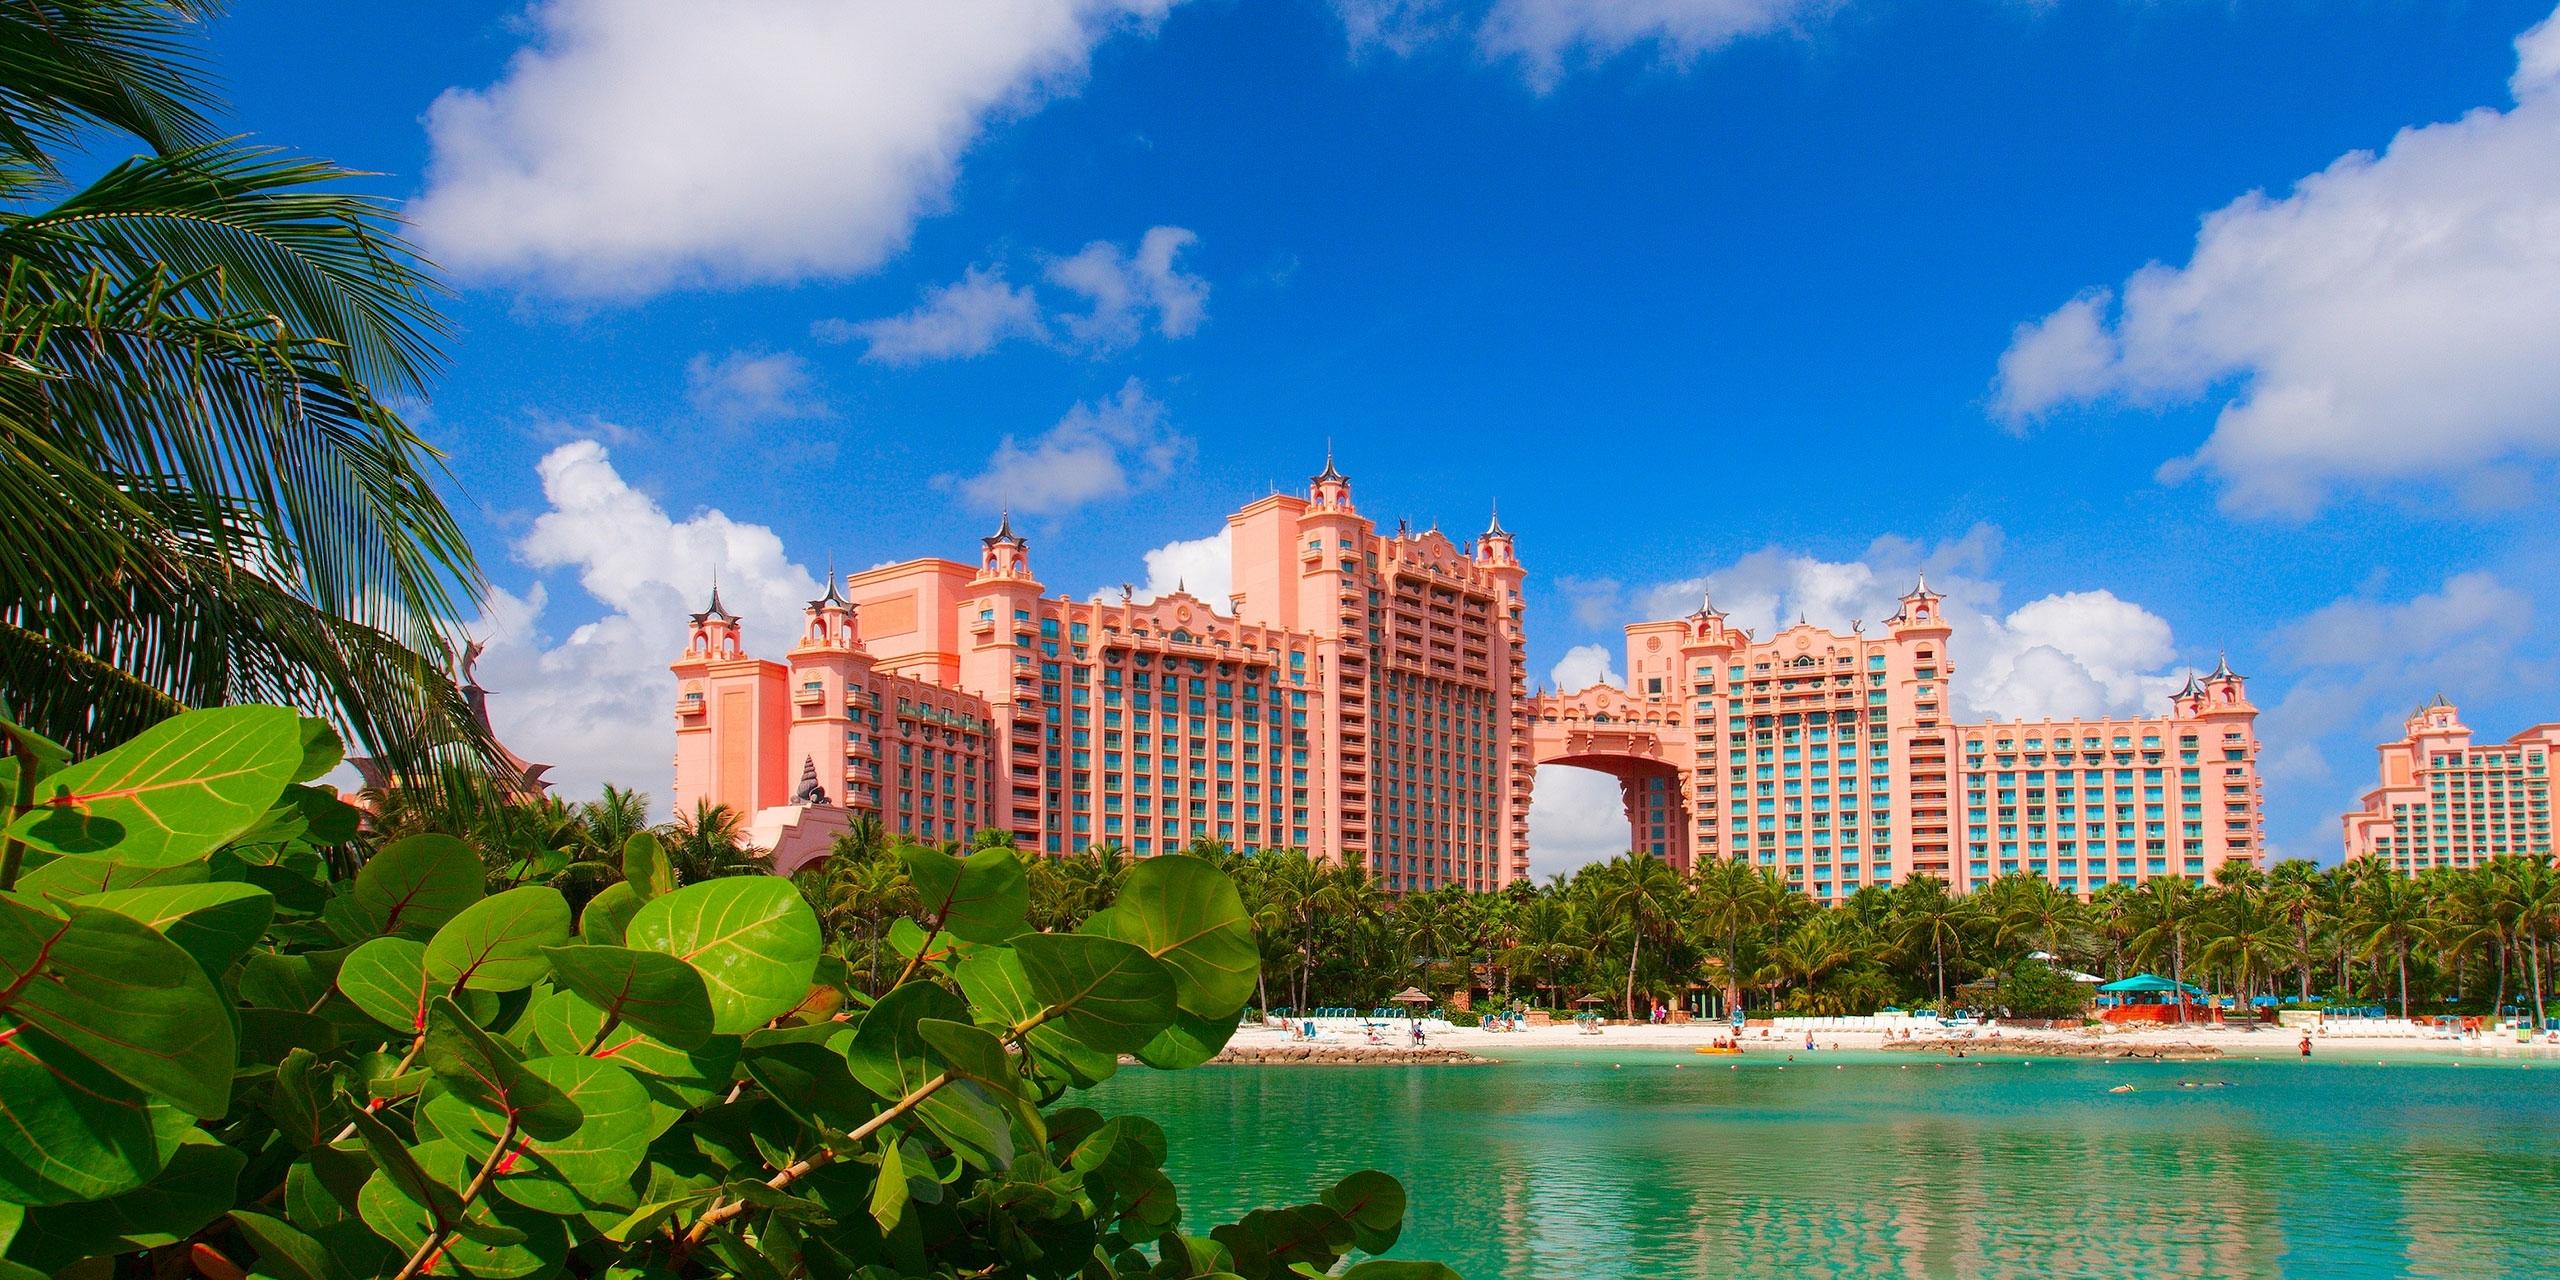 Atlantis Resort, Bahamas: The Ultimate Guide For Families within Travel To Atlantis Resort Bahamas